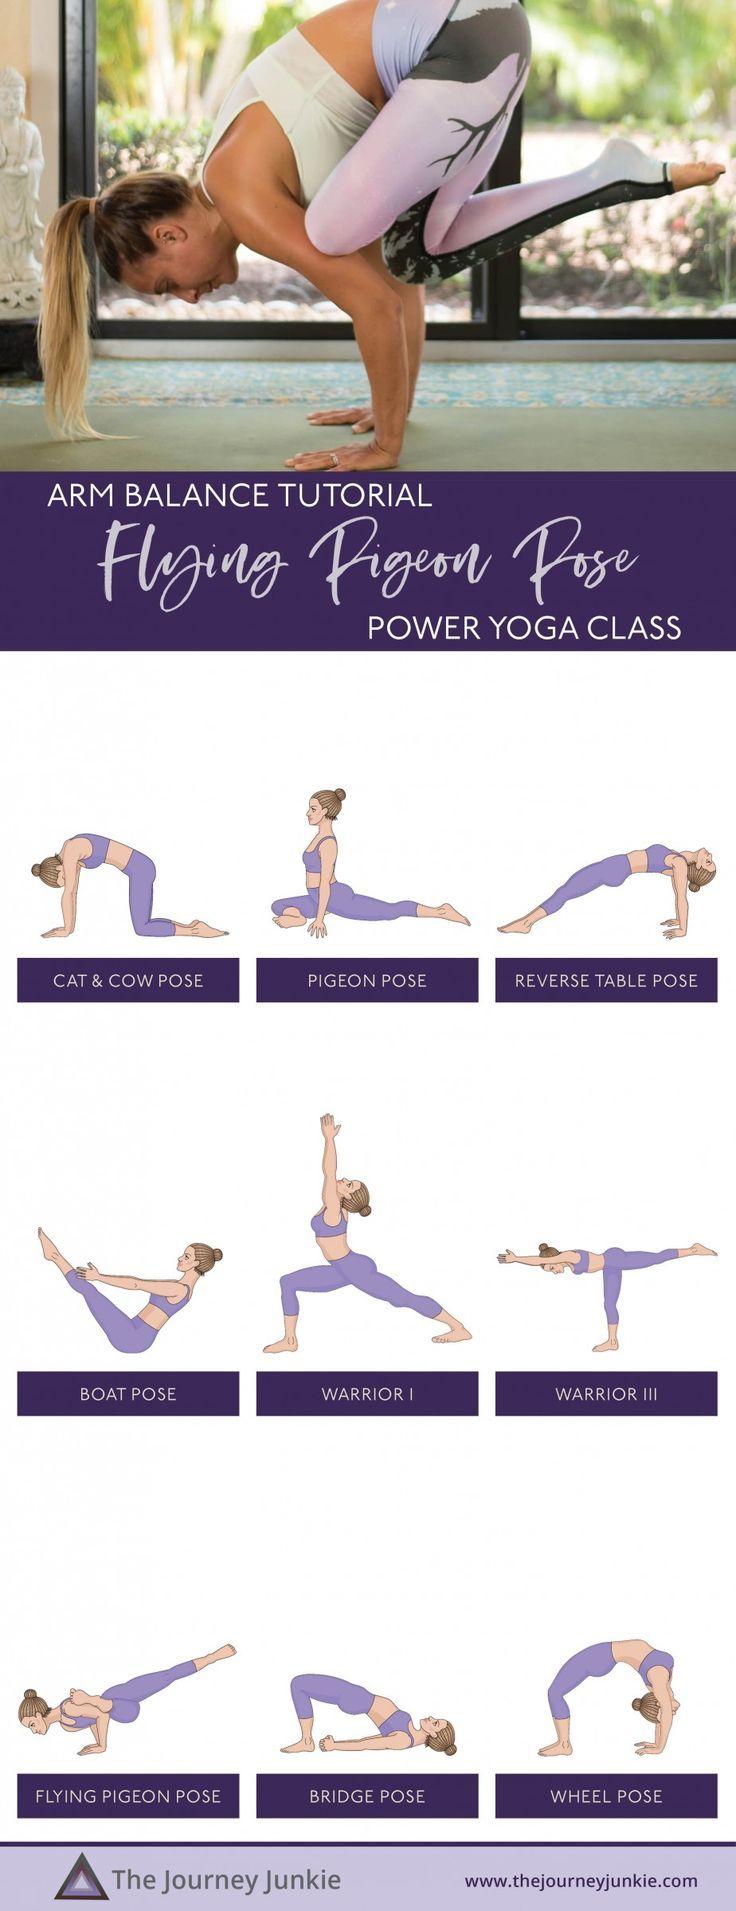 Arm Balance Power Yoga Flow